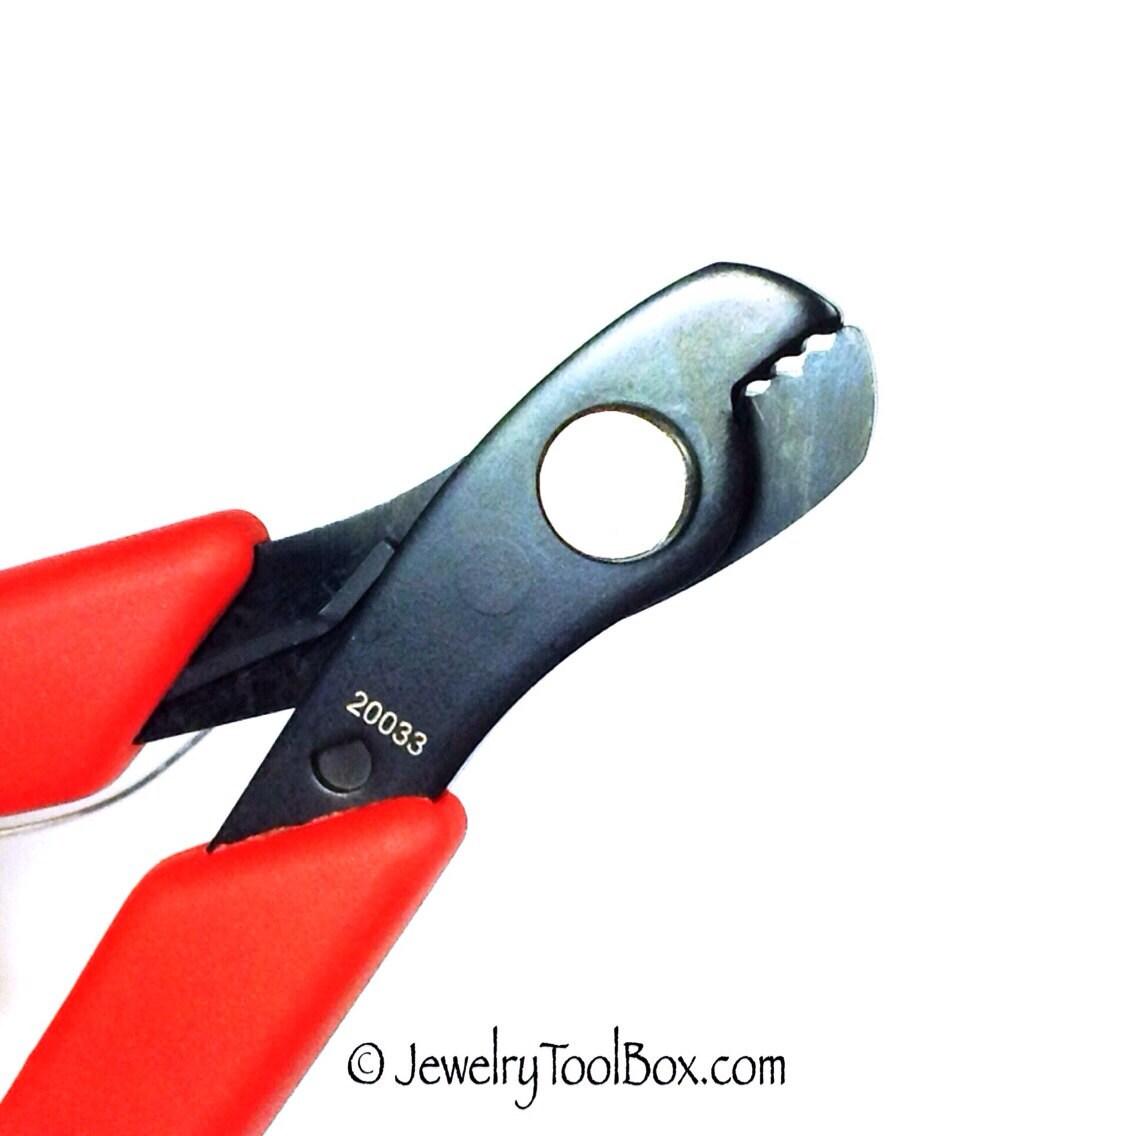 Memory Wire Cutter, Hard Wire Flush Cutter, Jewelry Making Pliers ...